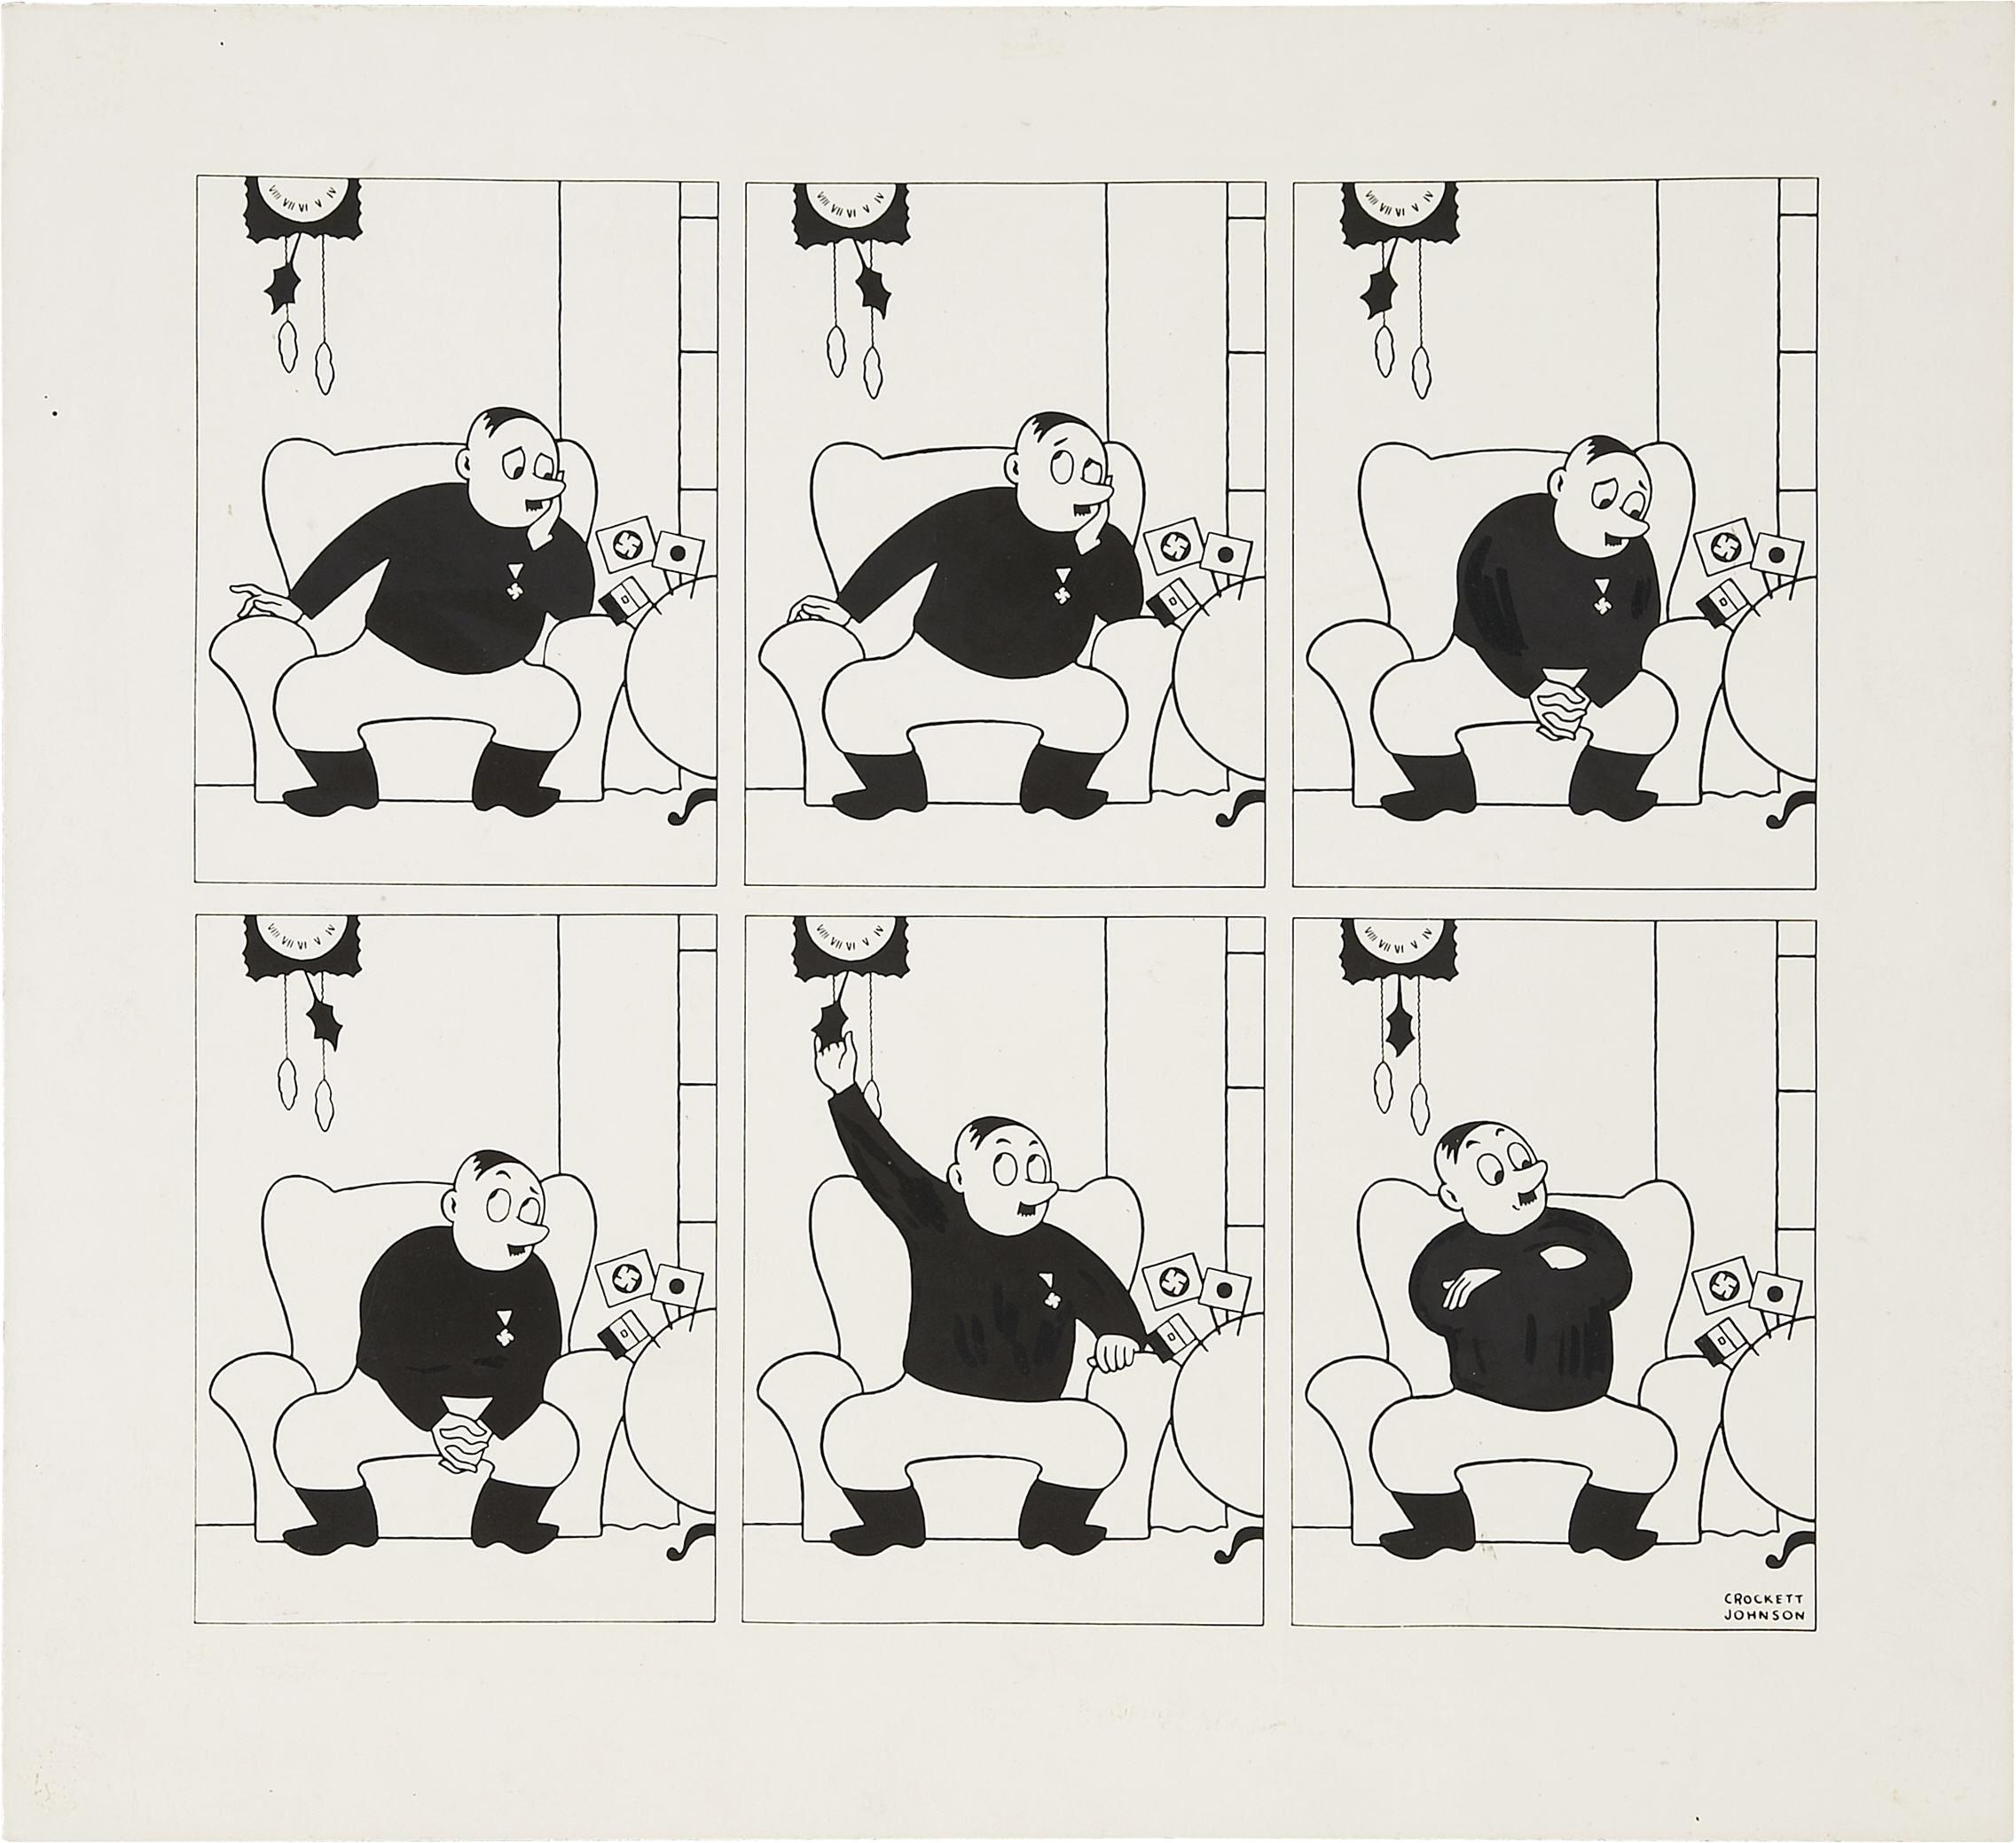 crockett johnson caricature of hitler 24 feb 1942